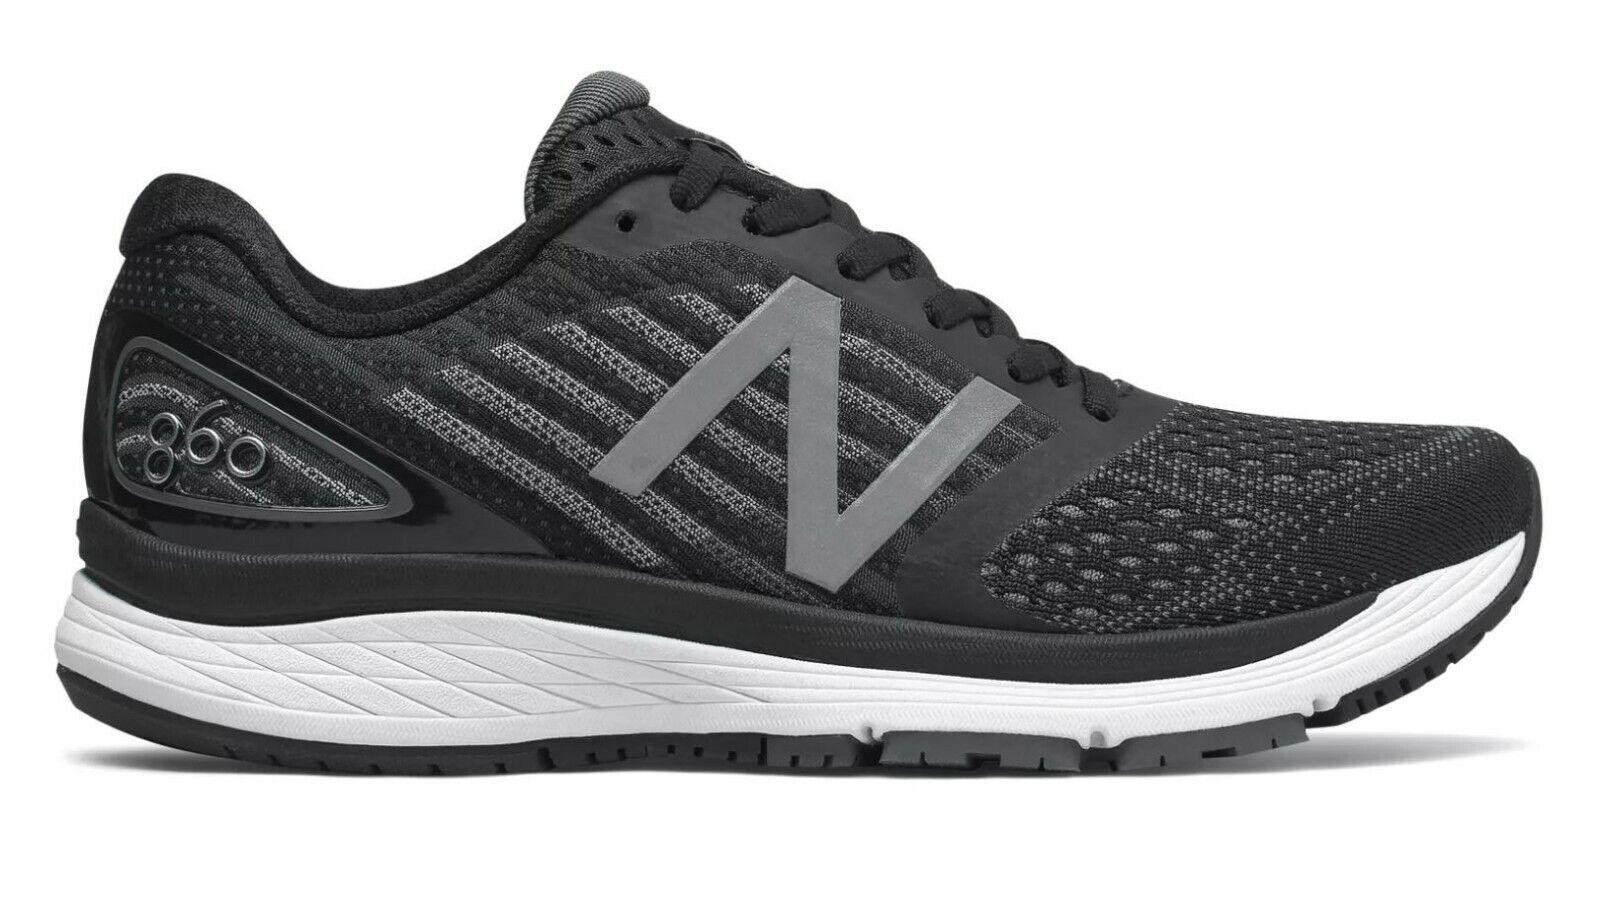 LATEST RELEASE New Balance 860 Womens Running shoes (D) (W860BK9) (003)